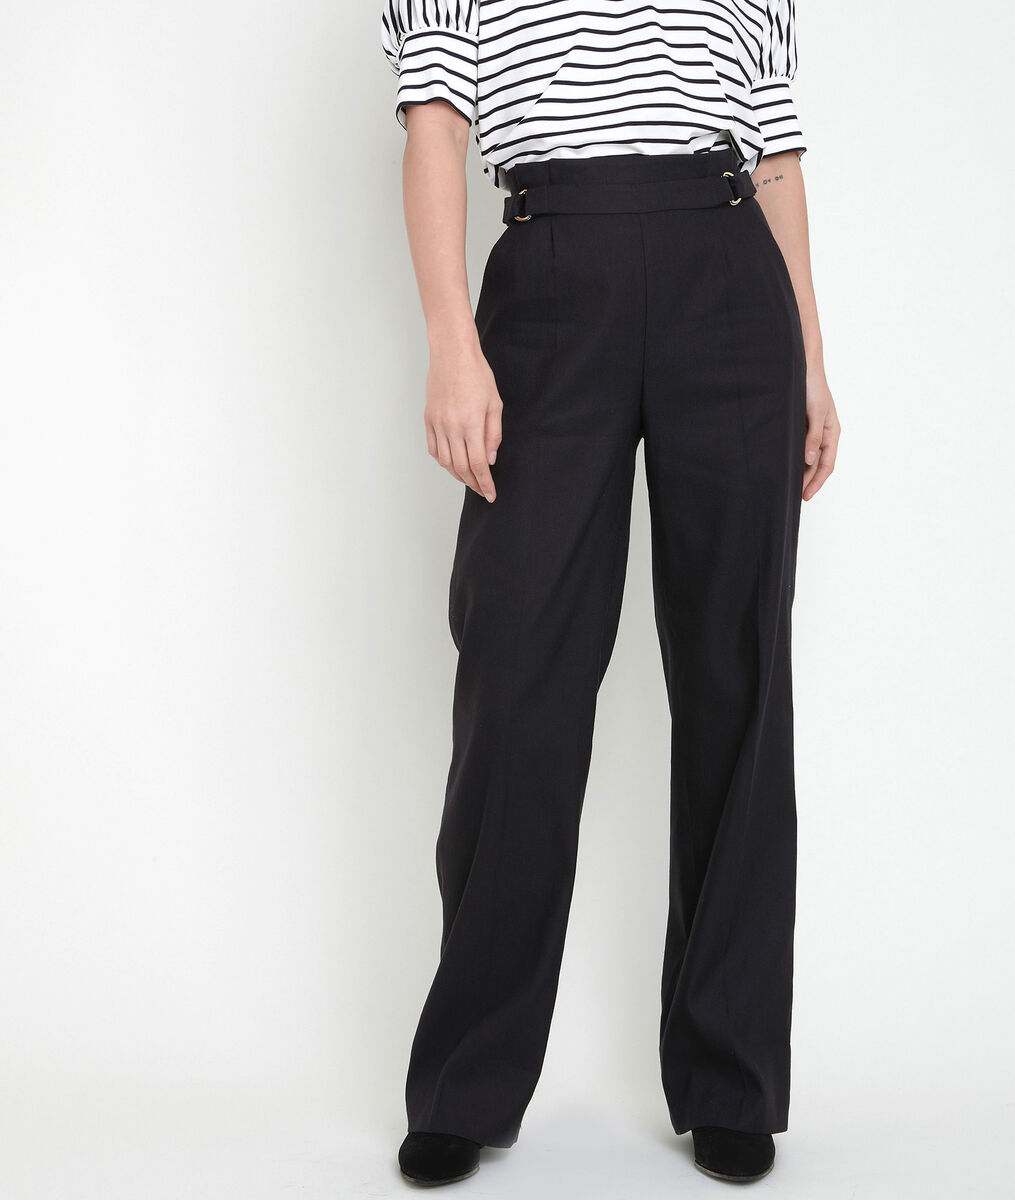 FILIPO black linen blend wide-legged trousers PhotoZ | 1-2-3